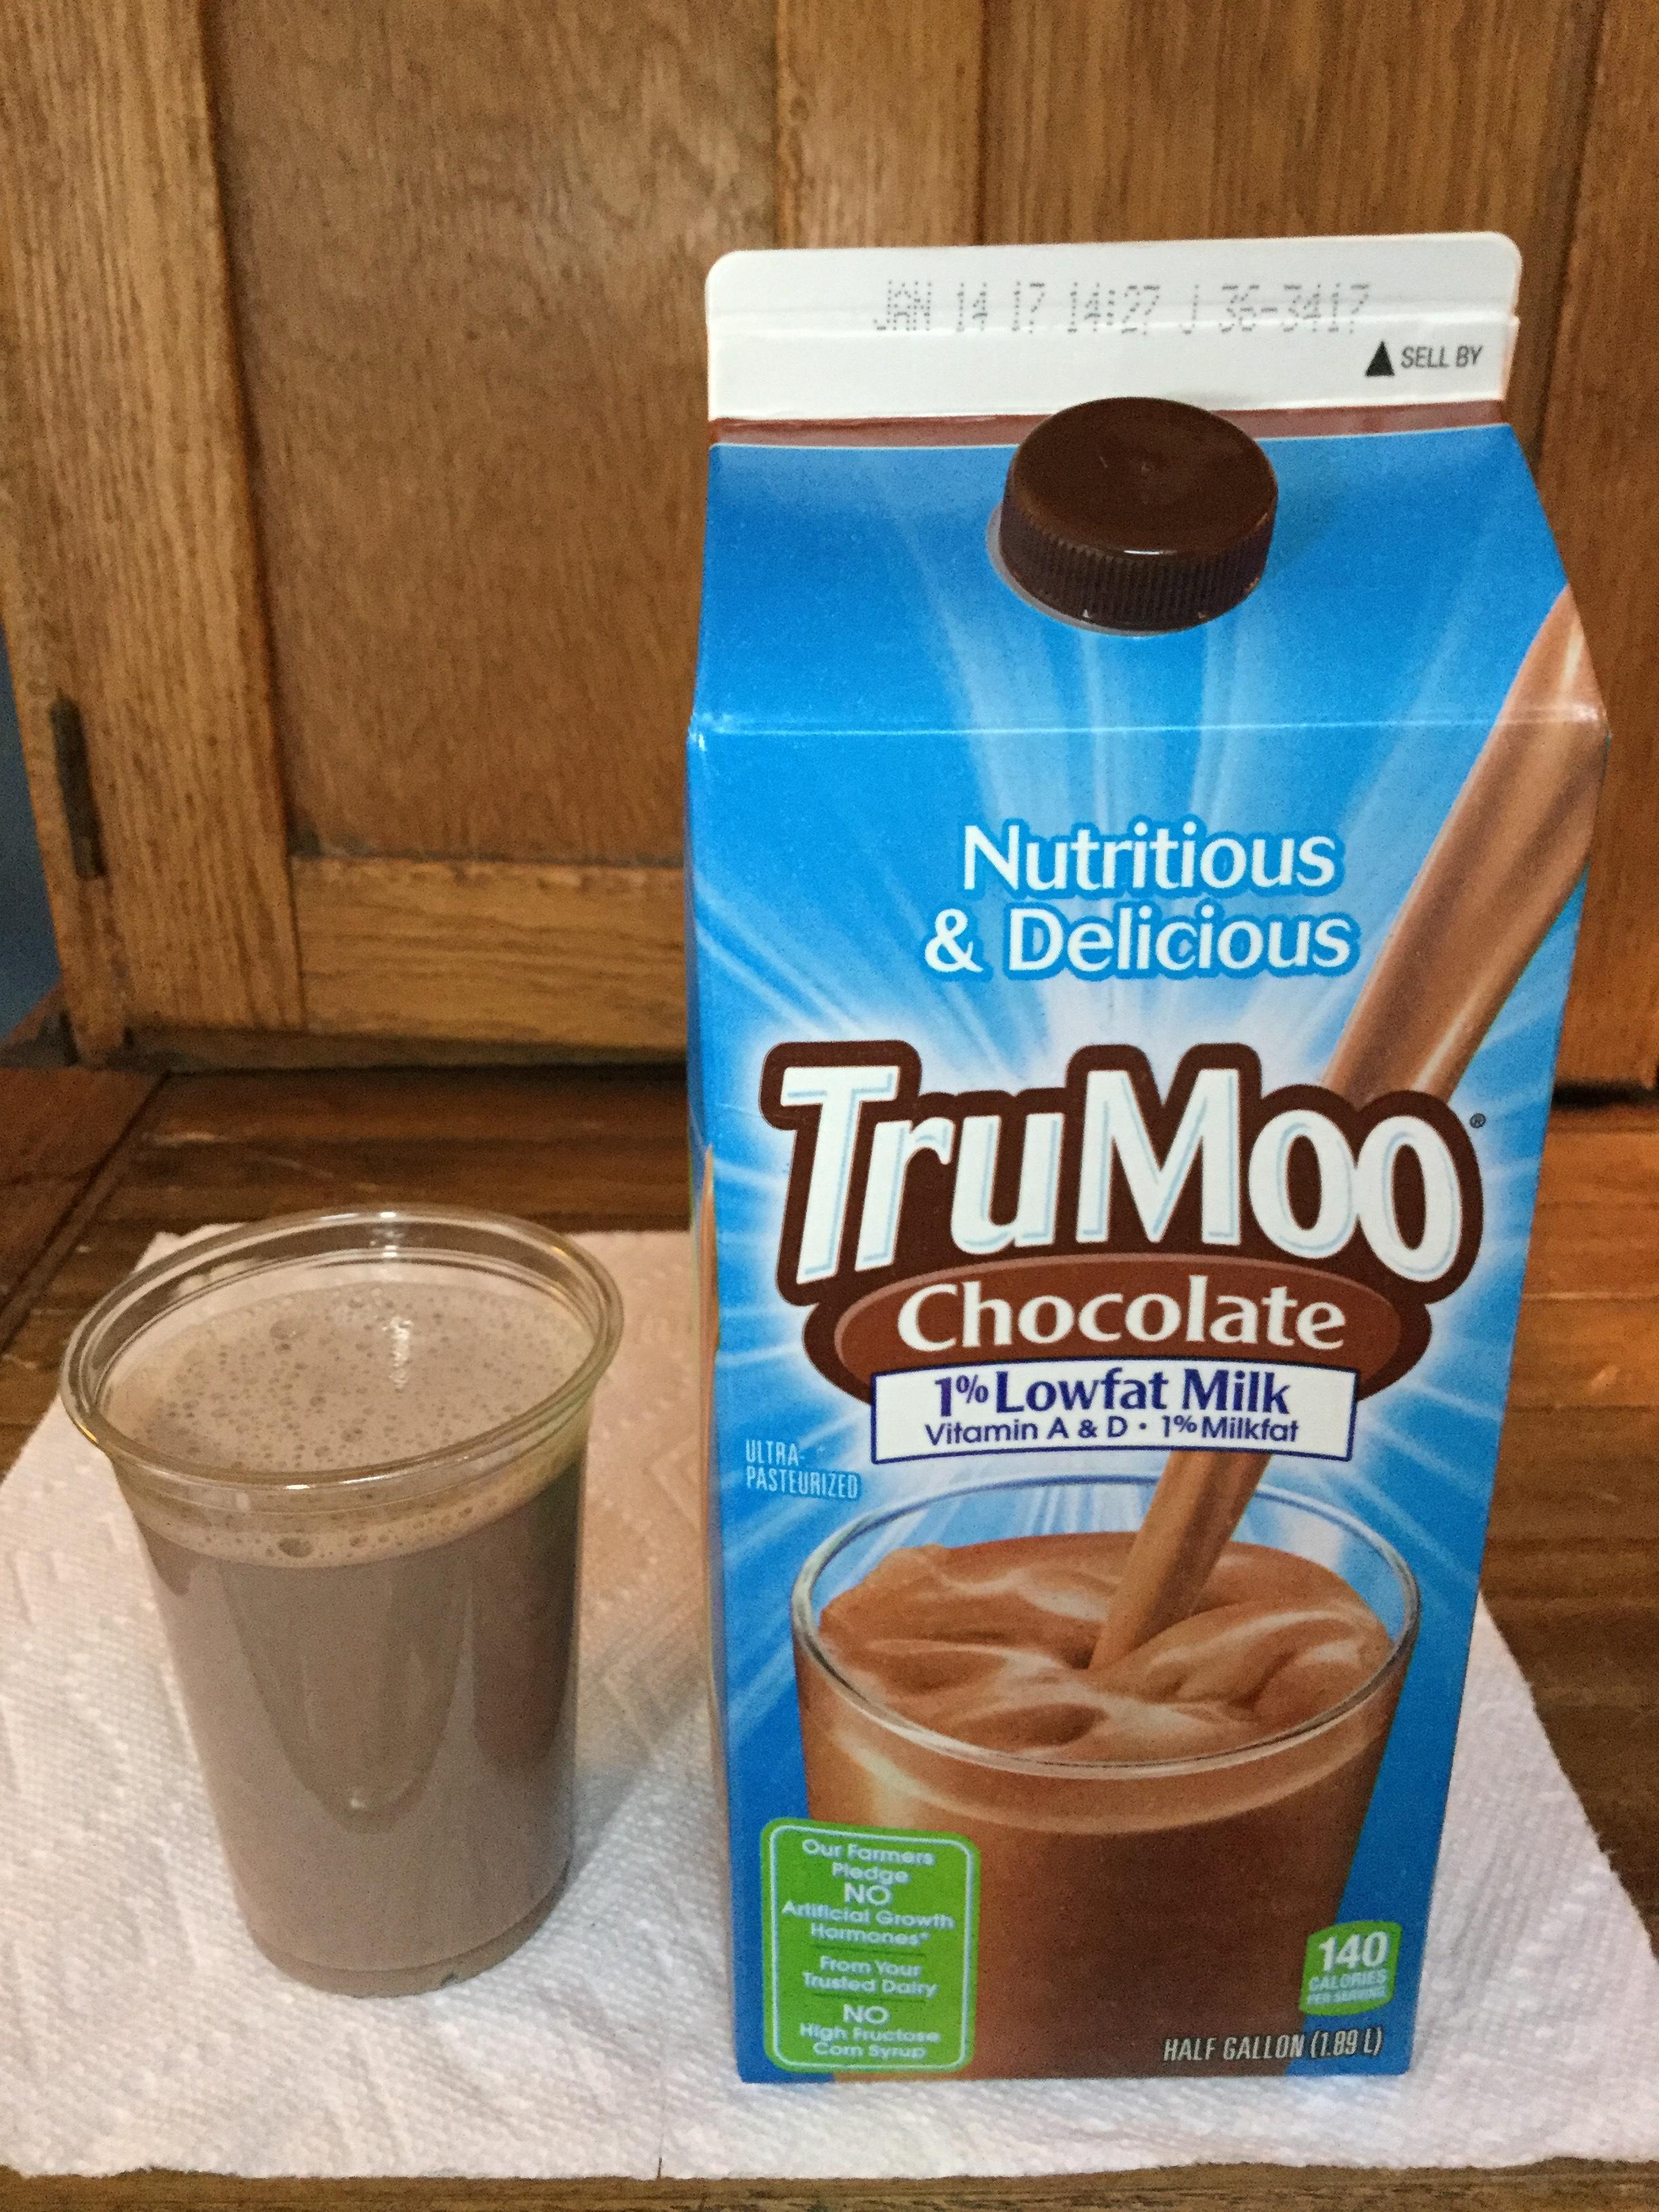 TruMoo Chocolate 1% Lowfat Milk Cup